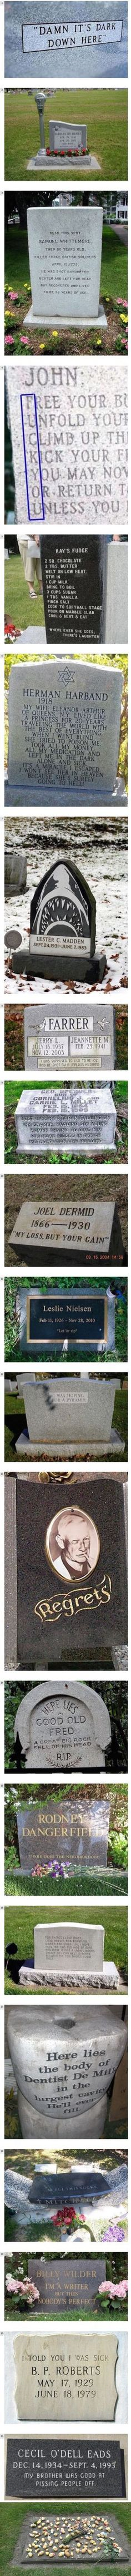 These 21 gravestones that definitely got the last laugh